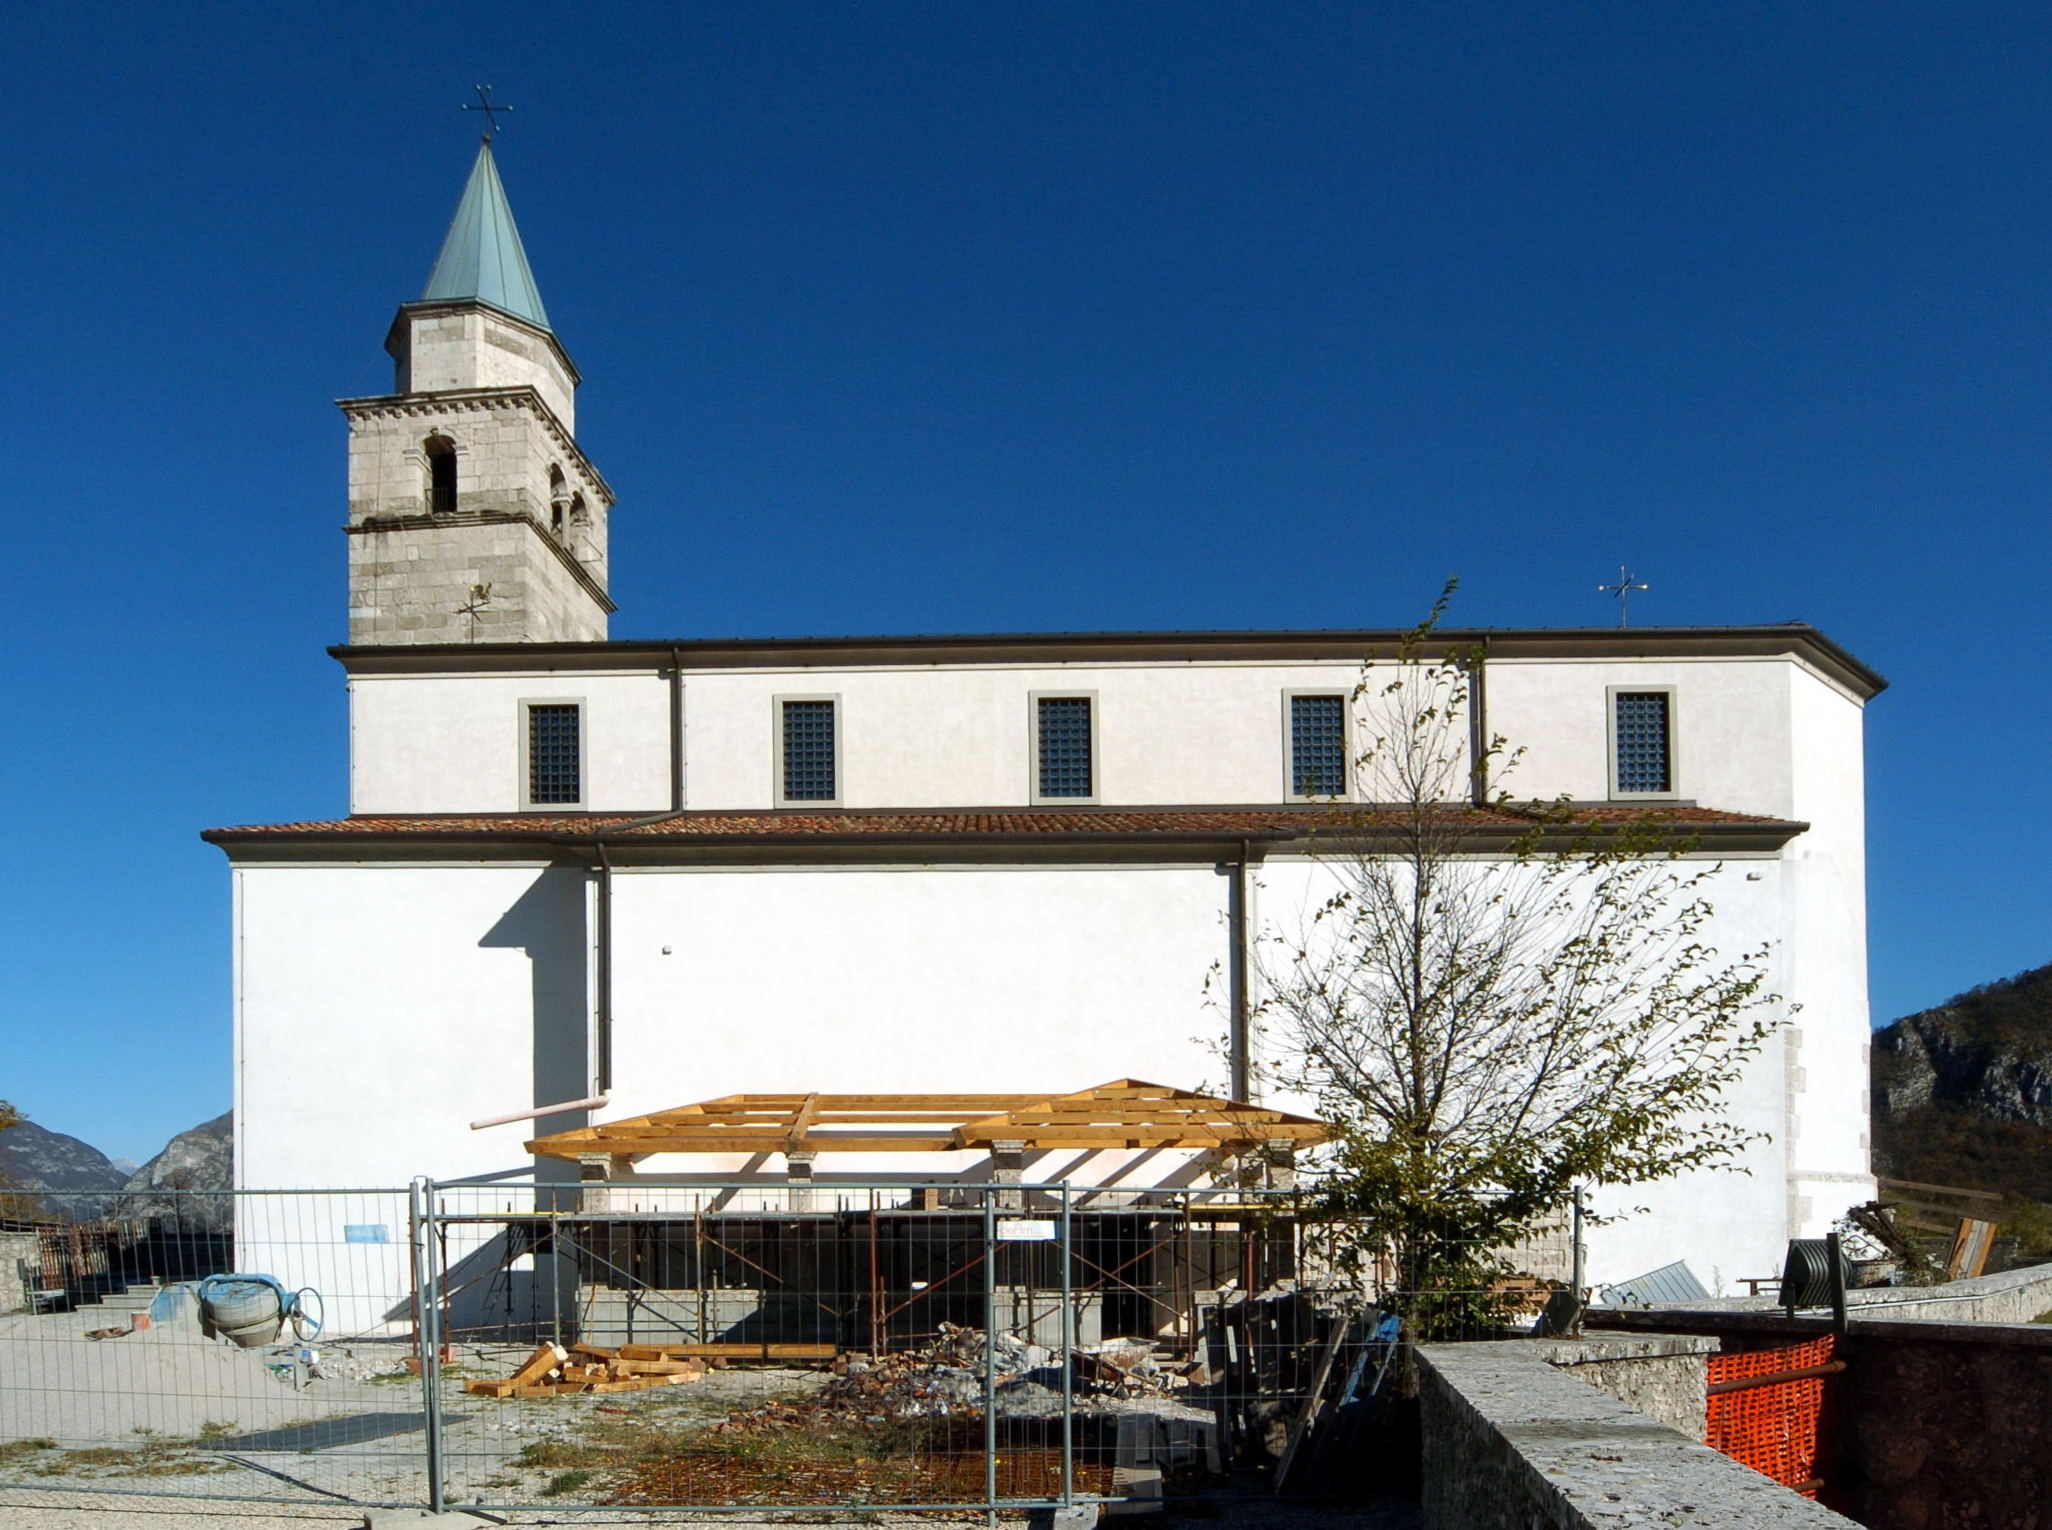 Pieve Santo Stefano Italy  city pictures gallery : Cavazzo Càrnico Cesclans Pieve di Santo Stefano 01112007 61 ...